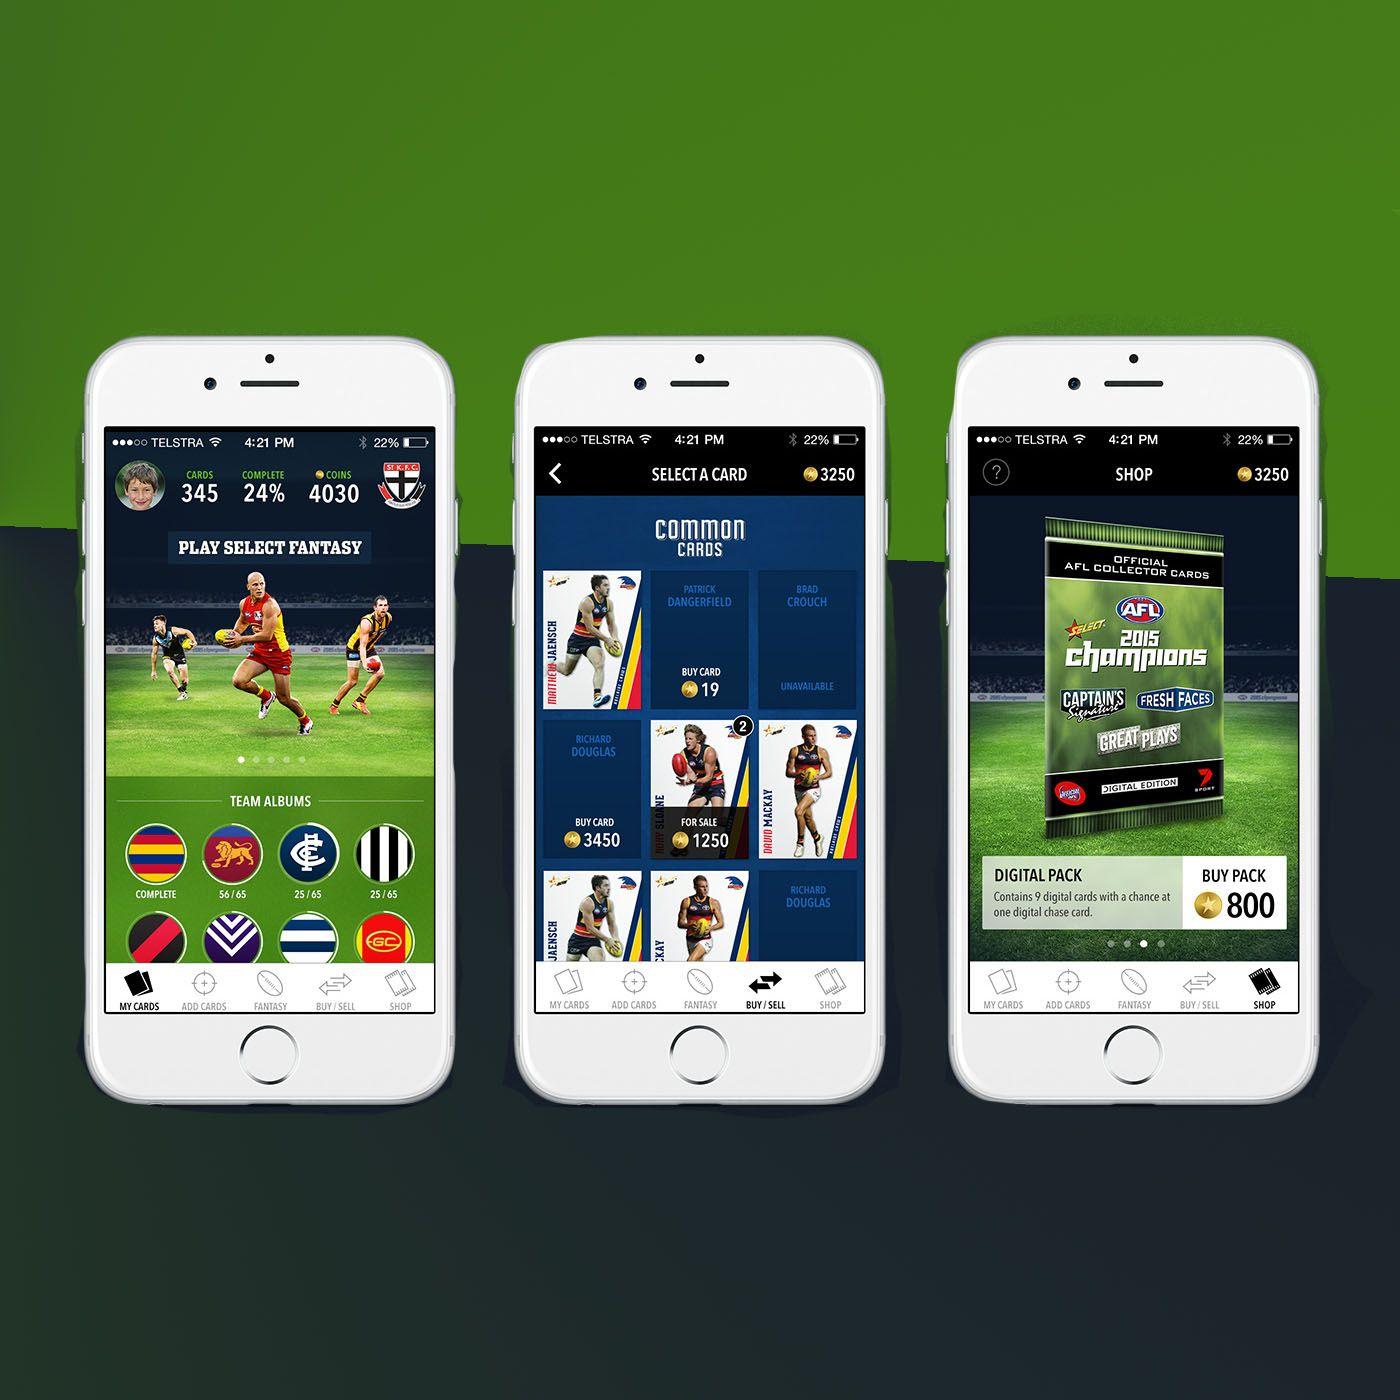 Footy Cards App.sports play digital champions team